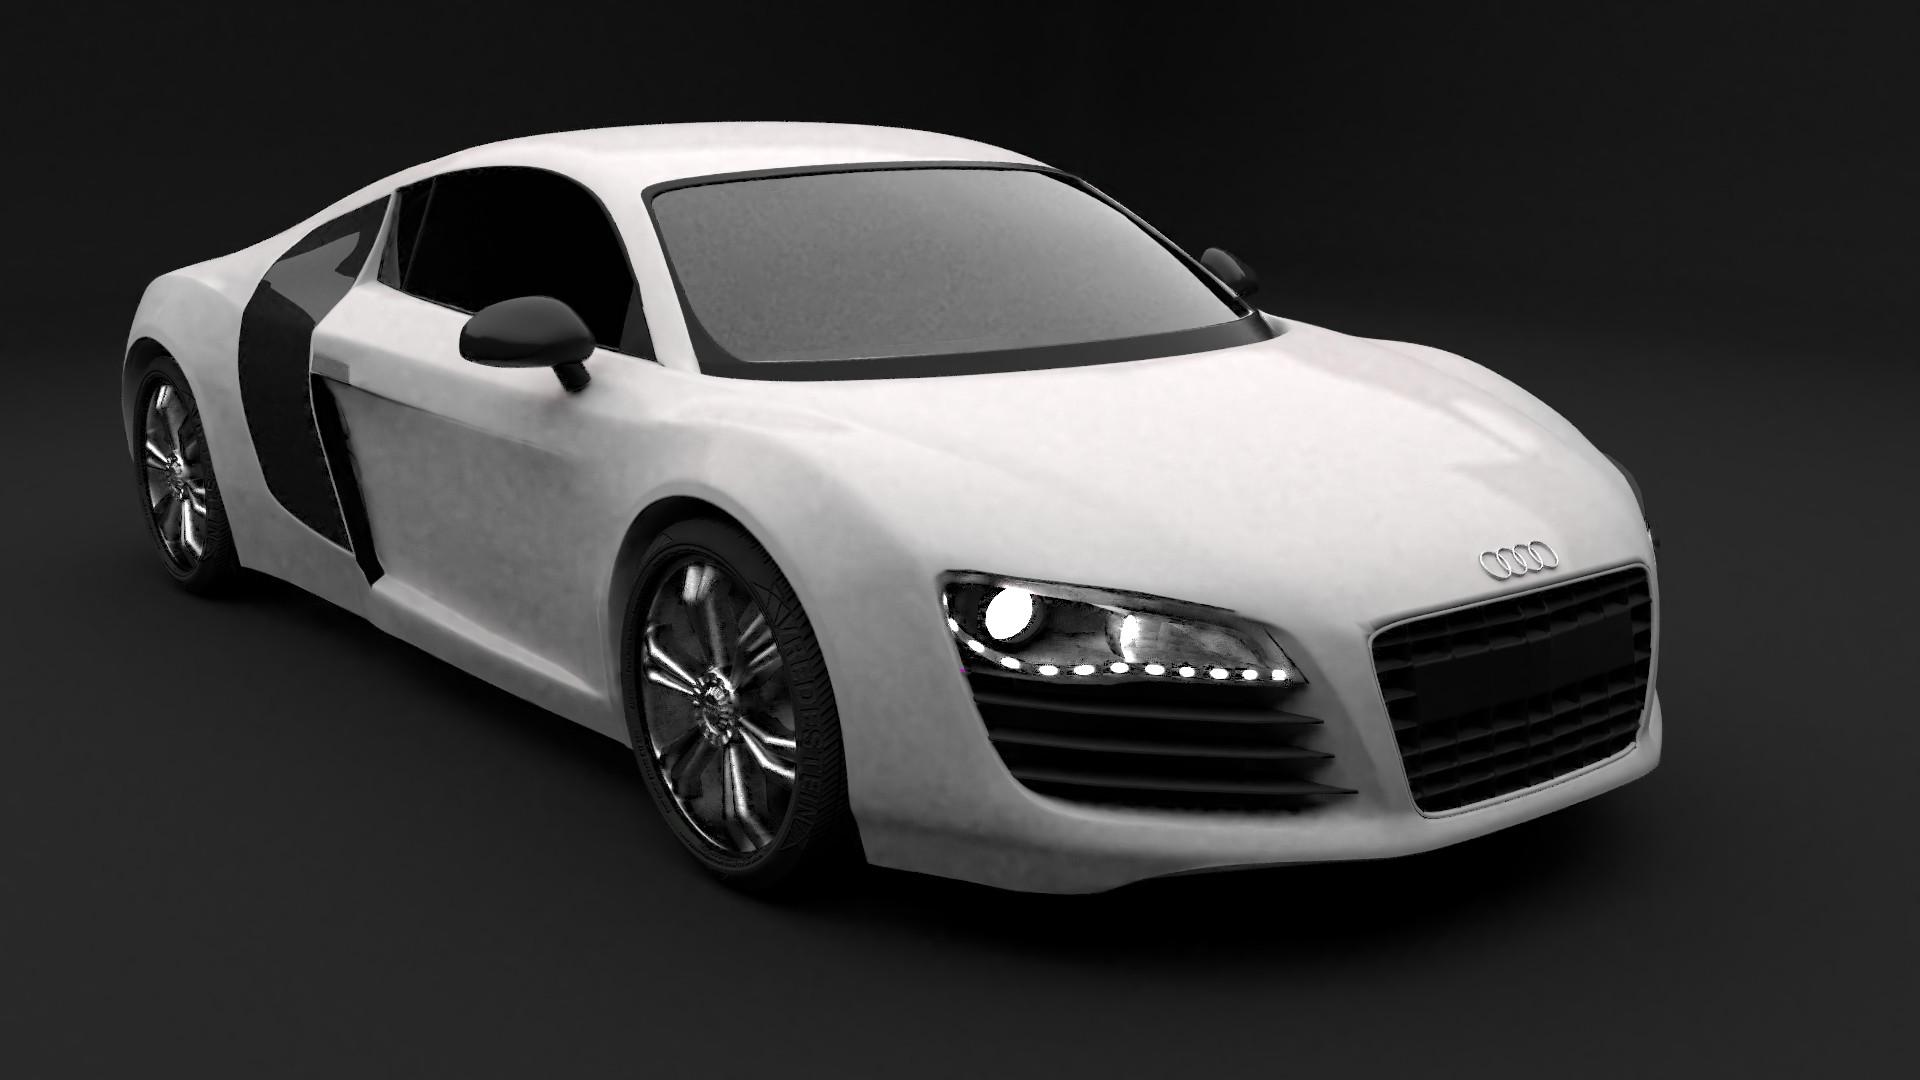 Kelebihan Kekurangan Audi R9 Murah Berkualitas